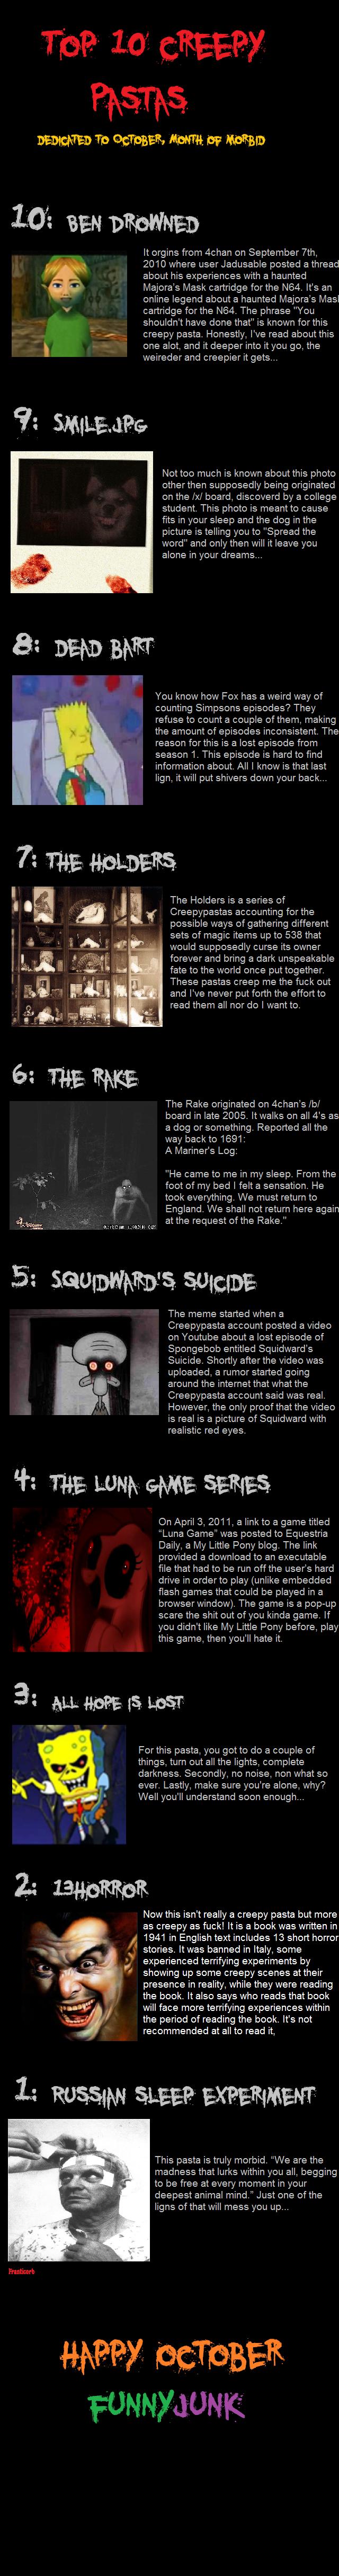 Top 10 Creepy Pasta's. Links knowyourmeme.com/memes/russian-sleep-experiment creepypasta.wikia.com/wiki/Squidward's_Suicide creepypasta.wikia.com/wiki/Hope_is_L